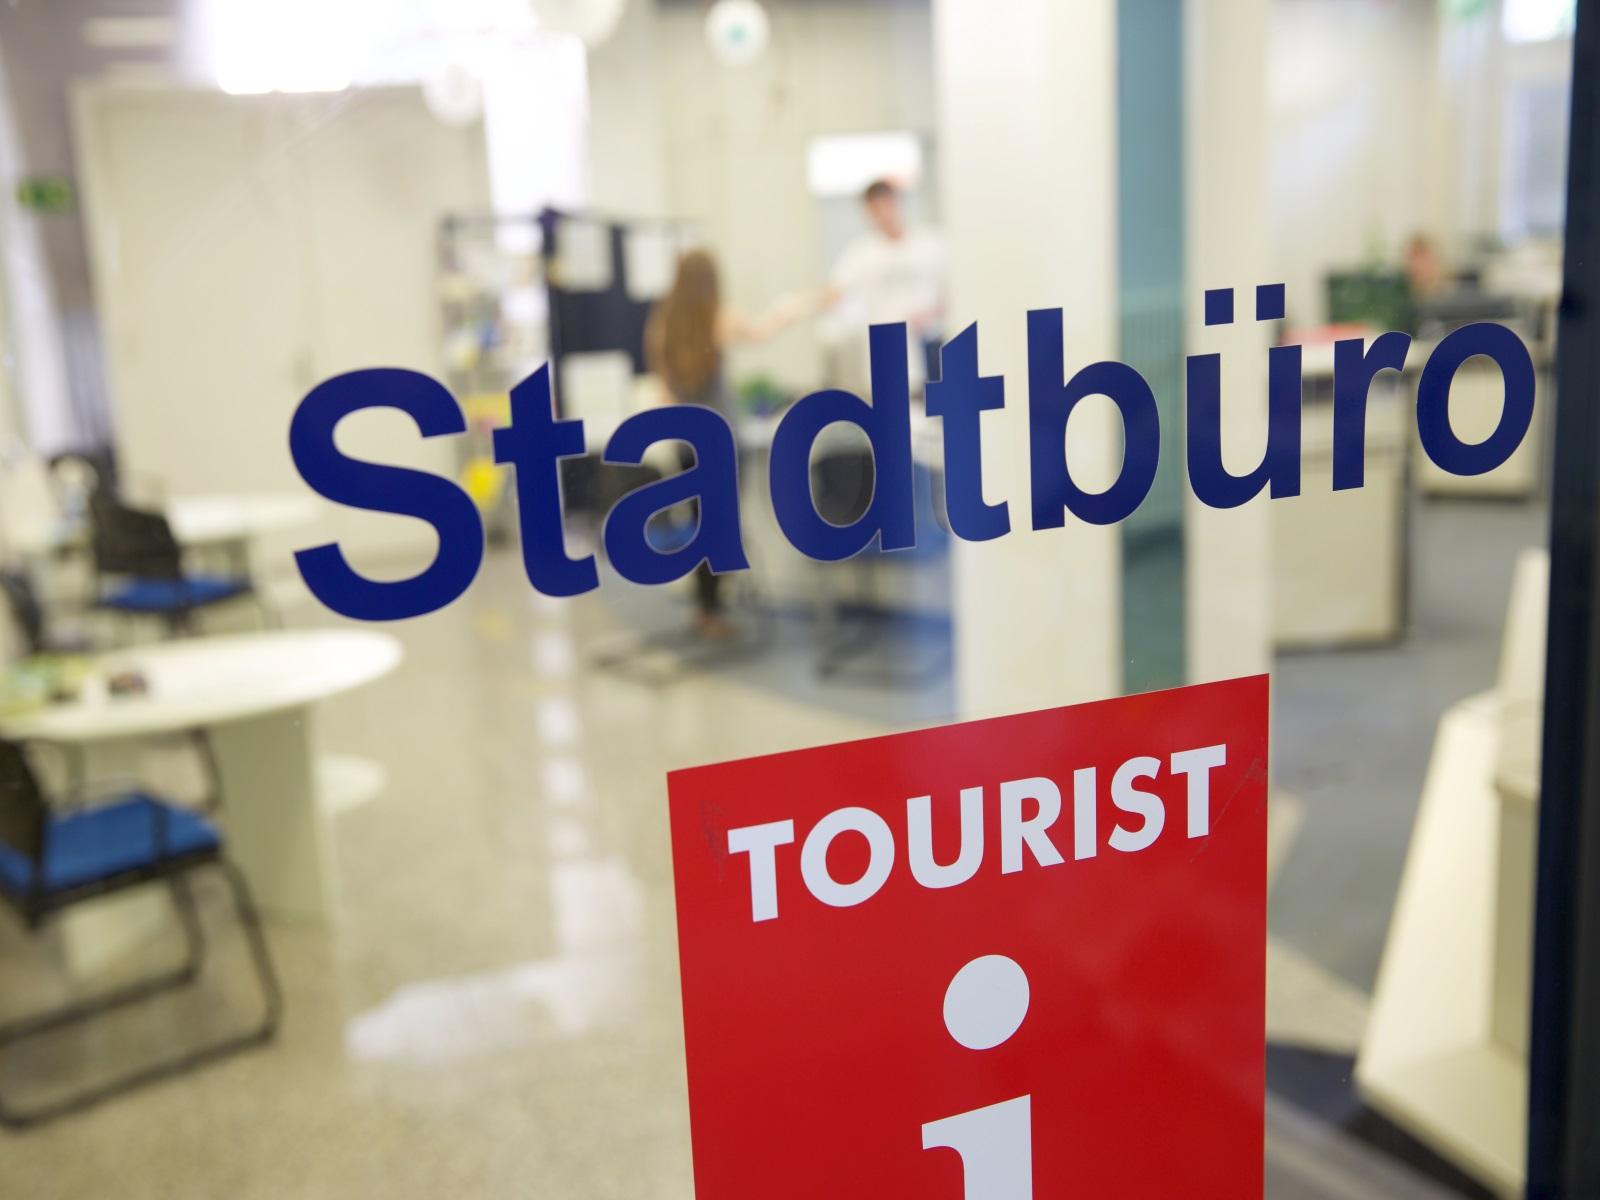 Stadtbüro, Touristinformation und Soziales